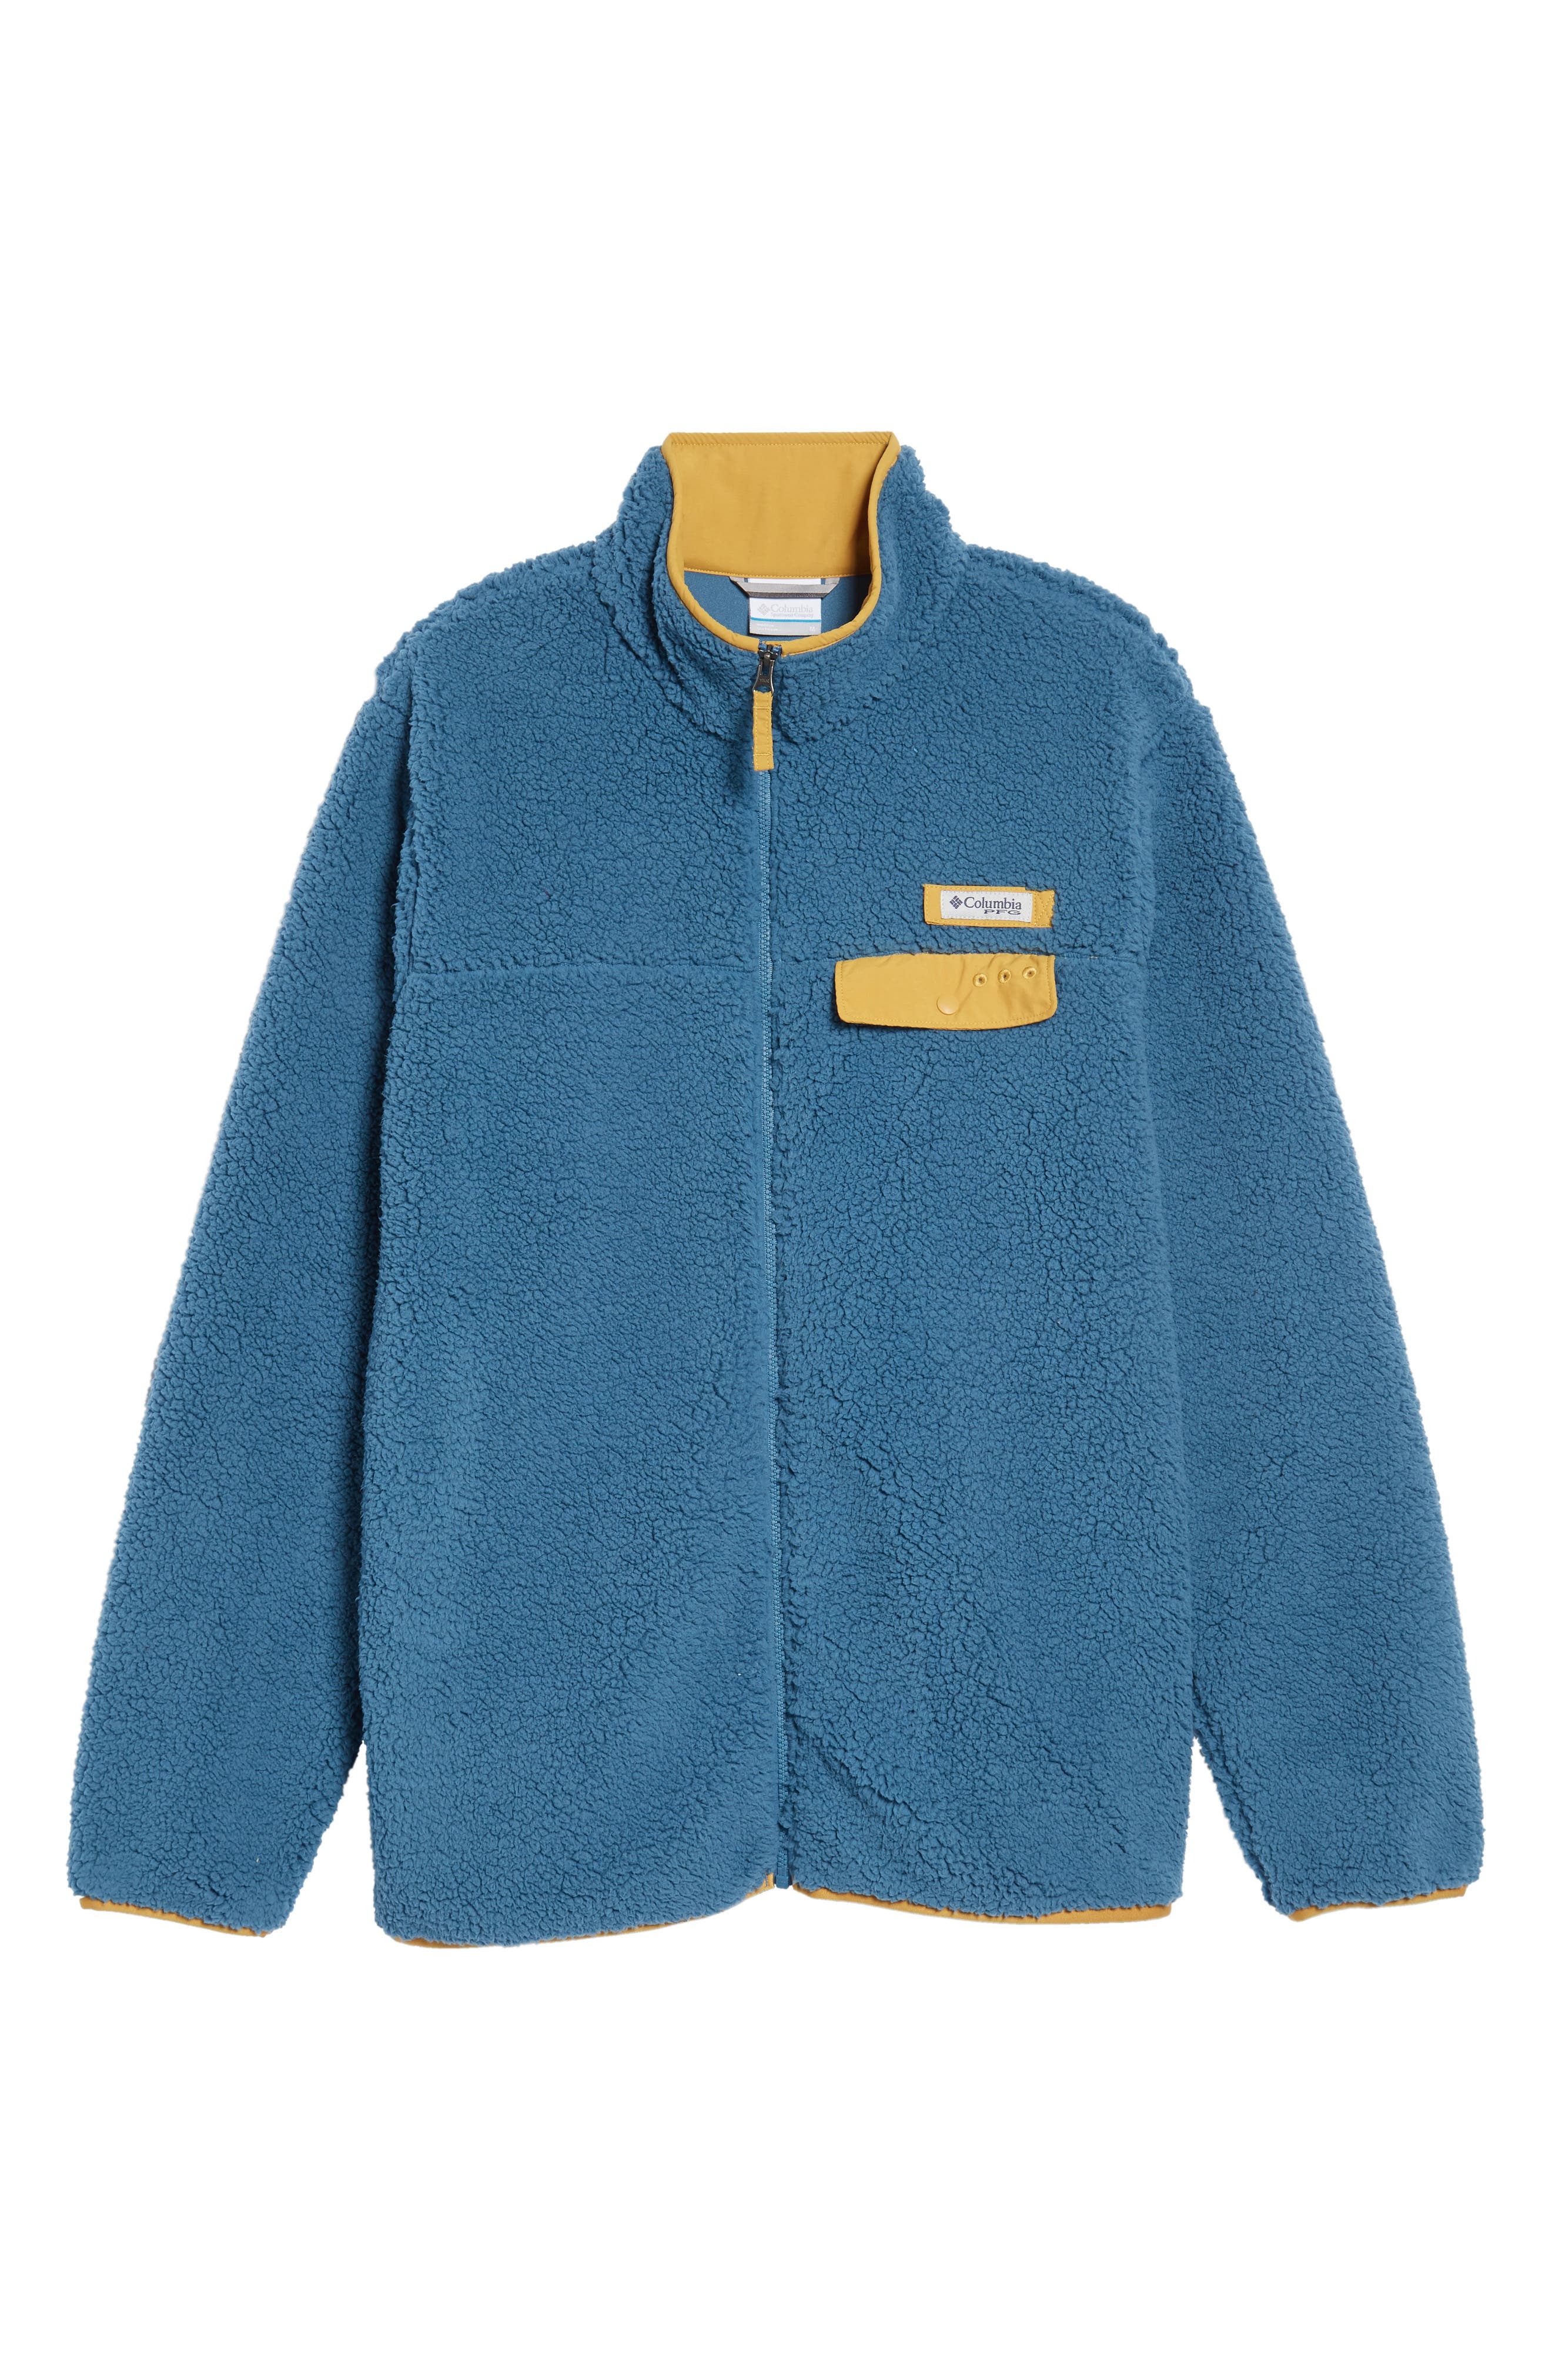 Harborside Fleece Jacket,                             Alternate thumbnail 23, color,